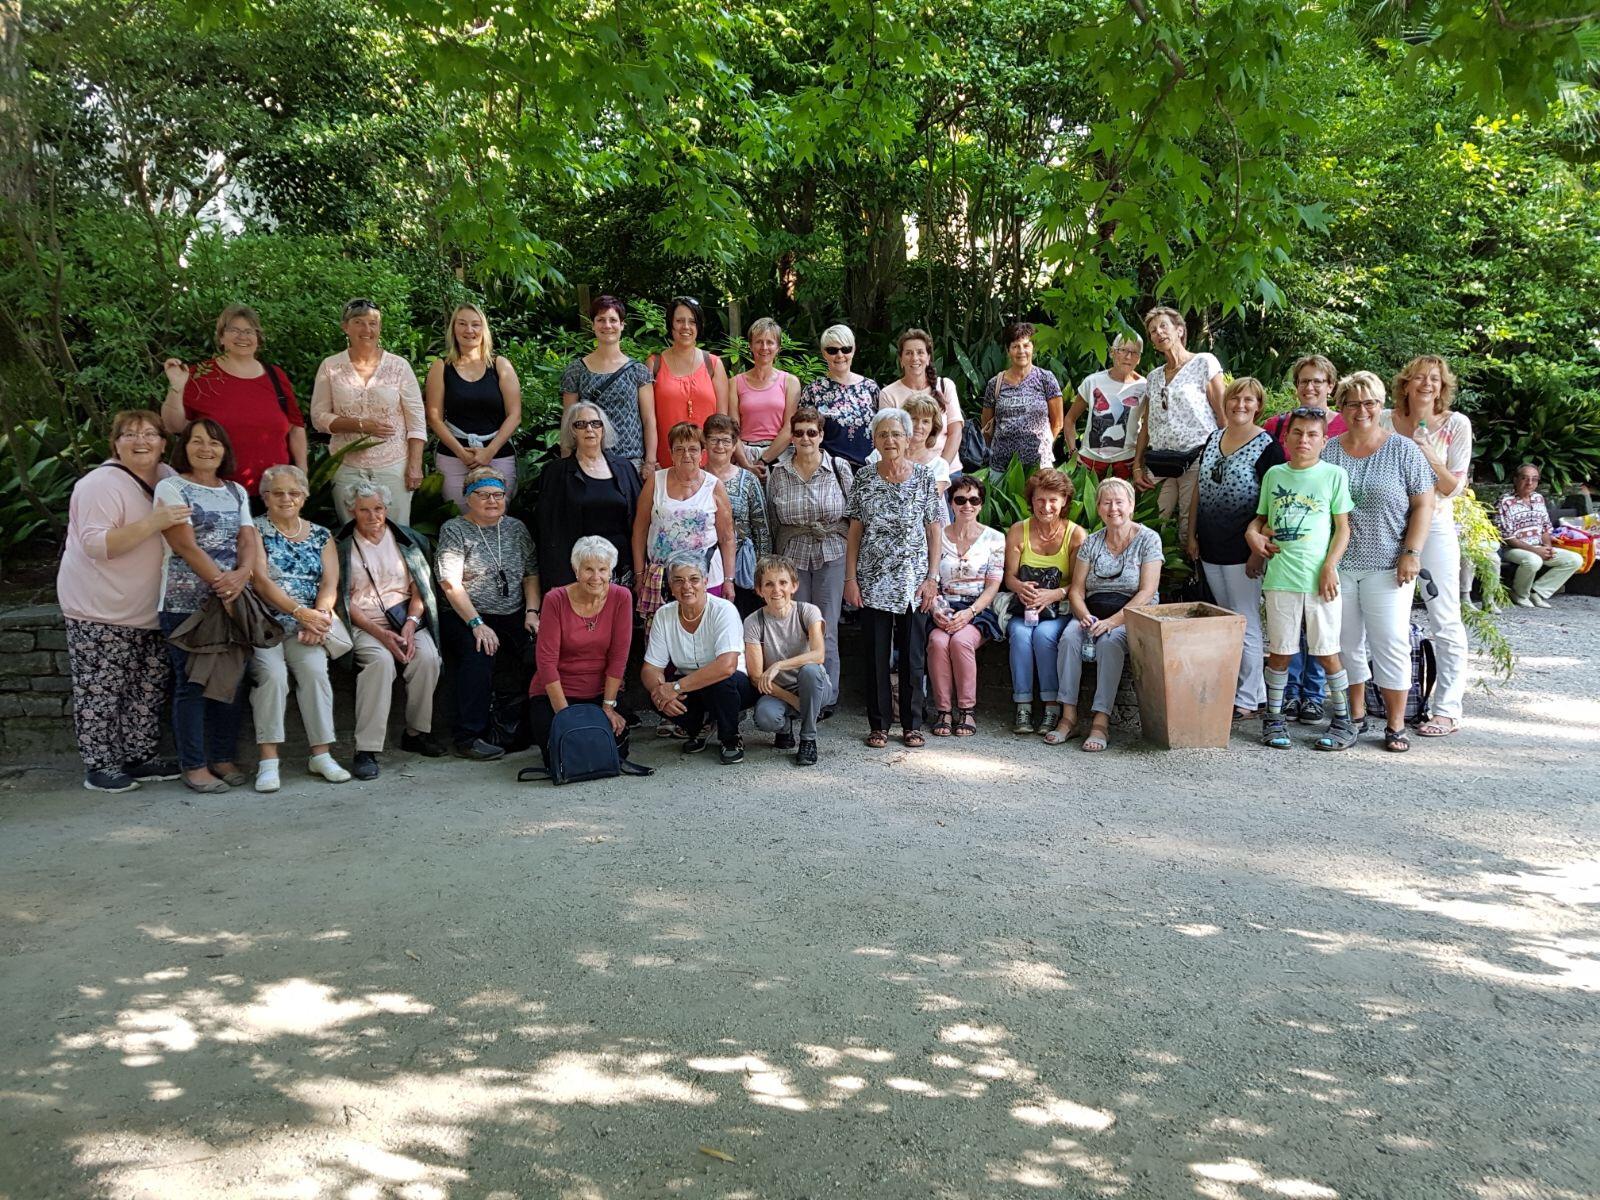 07.09.2017 Vereinsreise ins Tessin